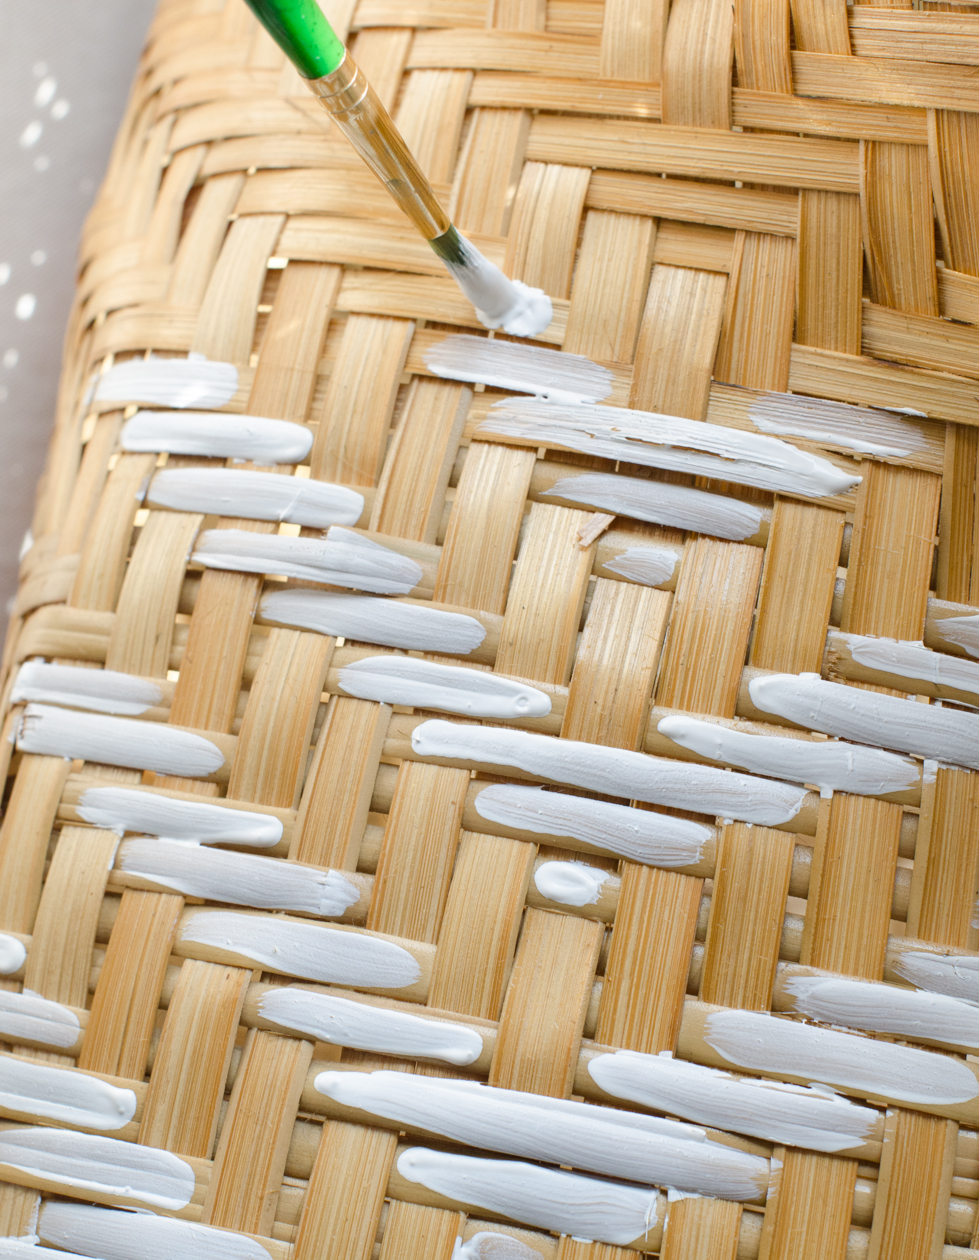 Christie-Cook-Den-Mother-rattan-DIY-Ikat-plant-holder-Los-Angeles-design-paining